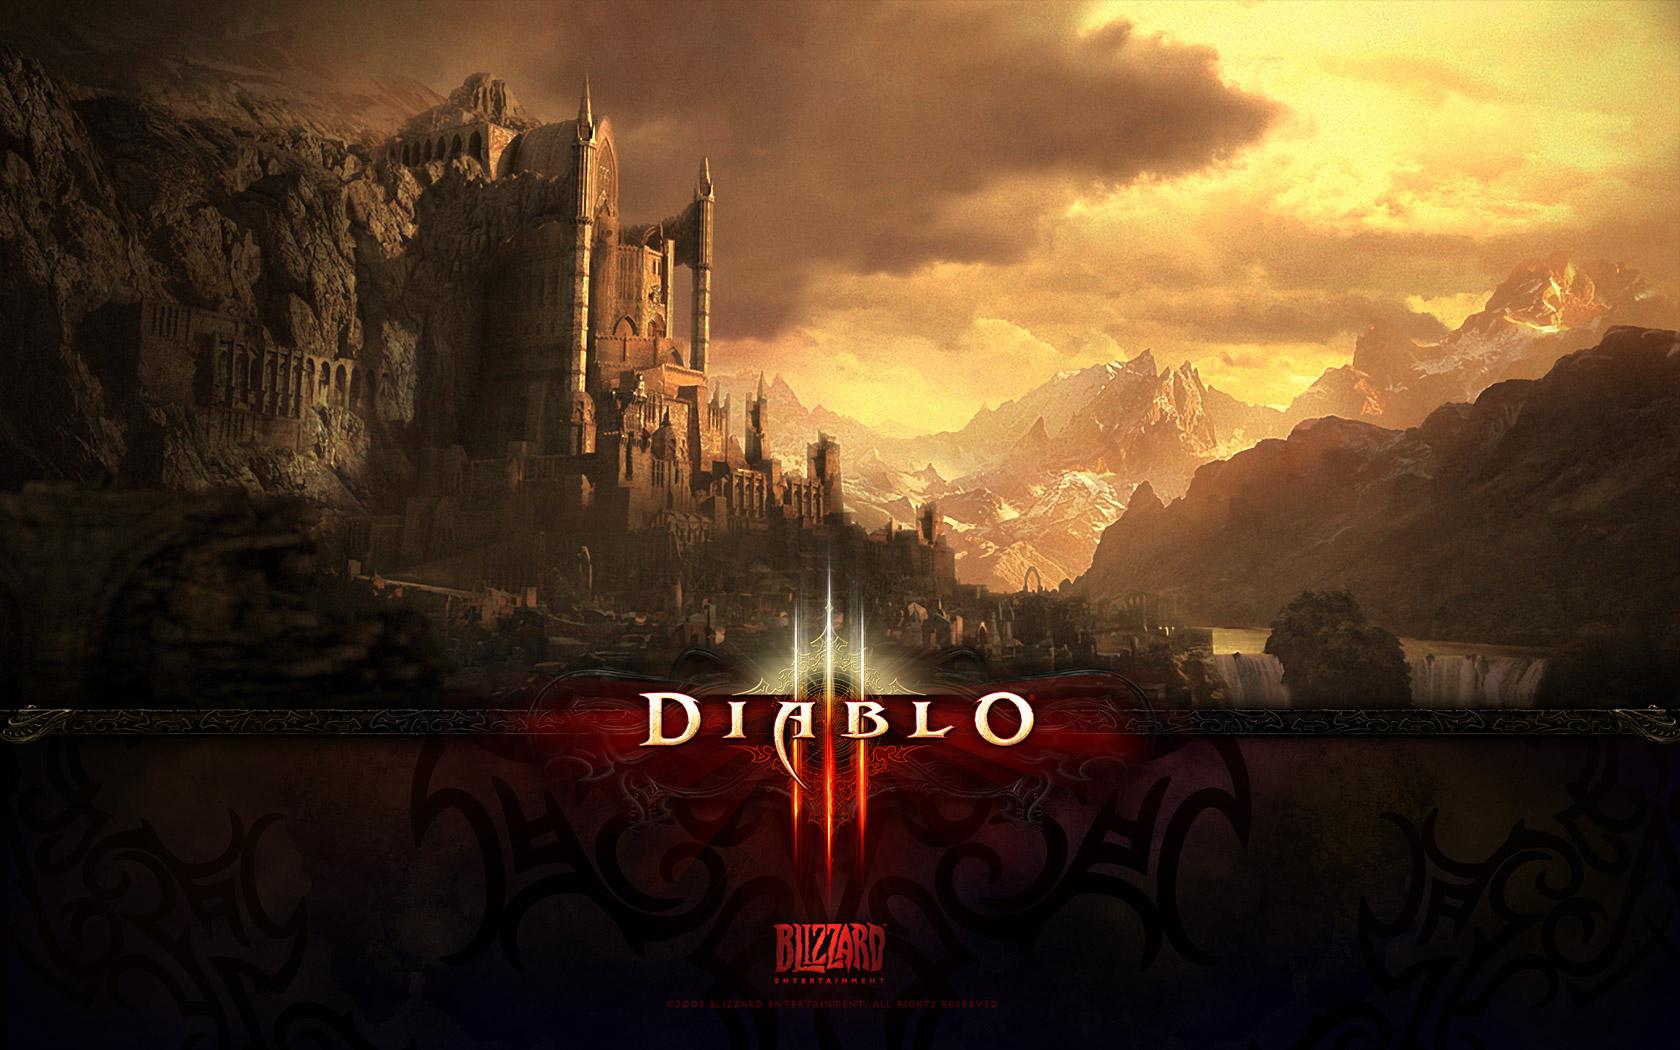 Blizzard Entertainment Wallpaper 1680x1050 Blizzard Entertainment 1680x1050